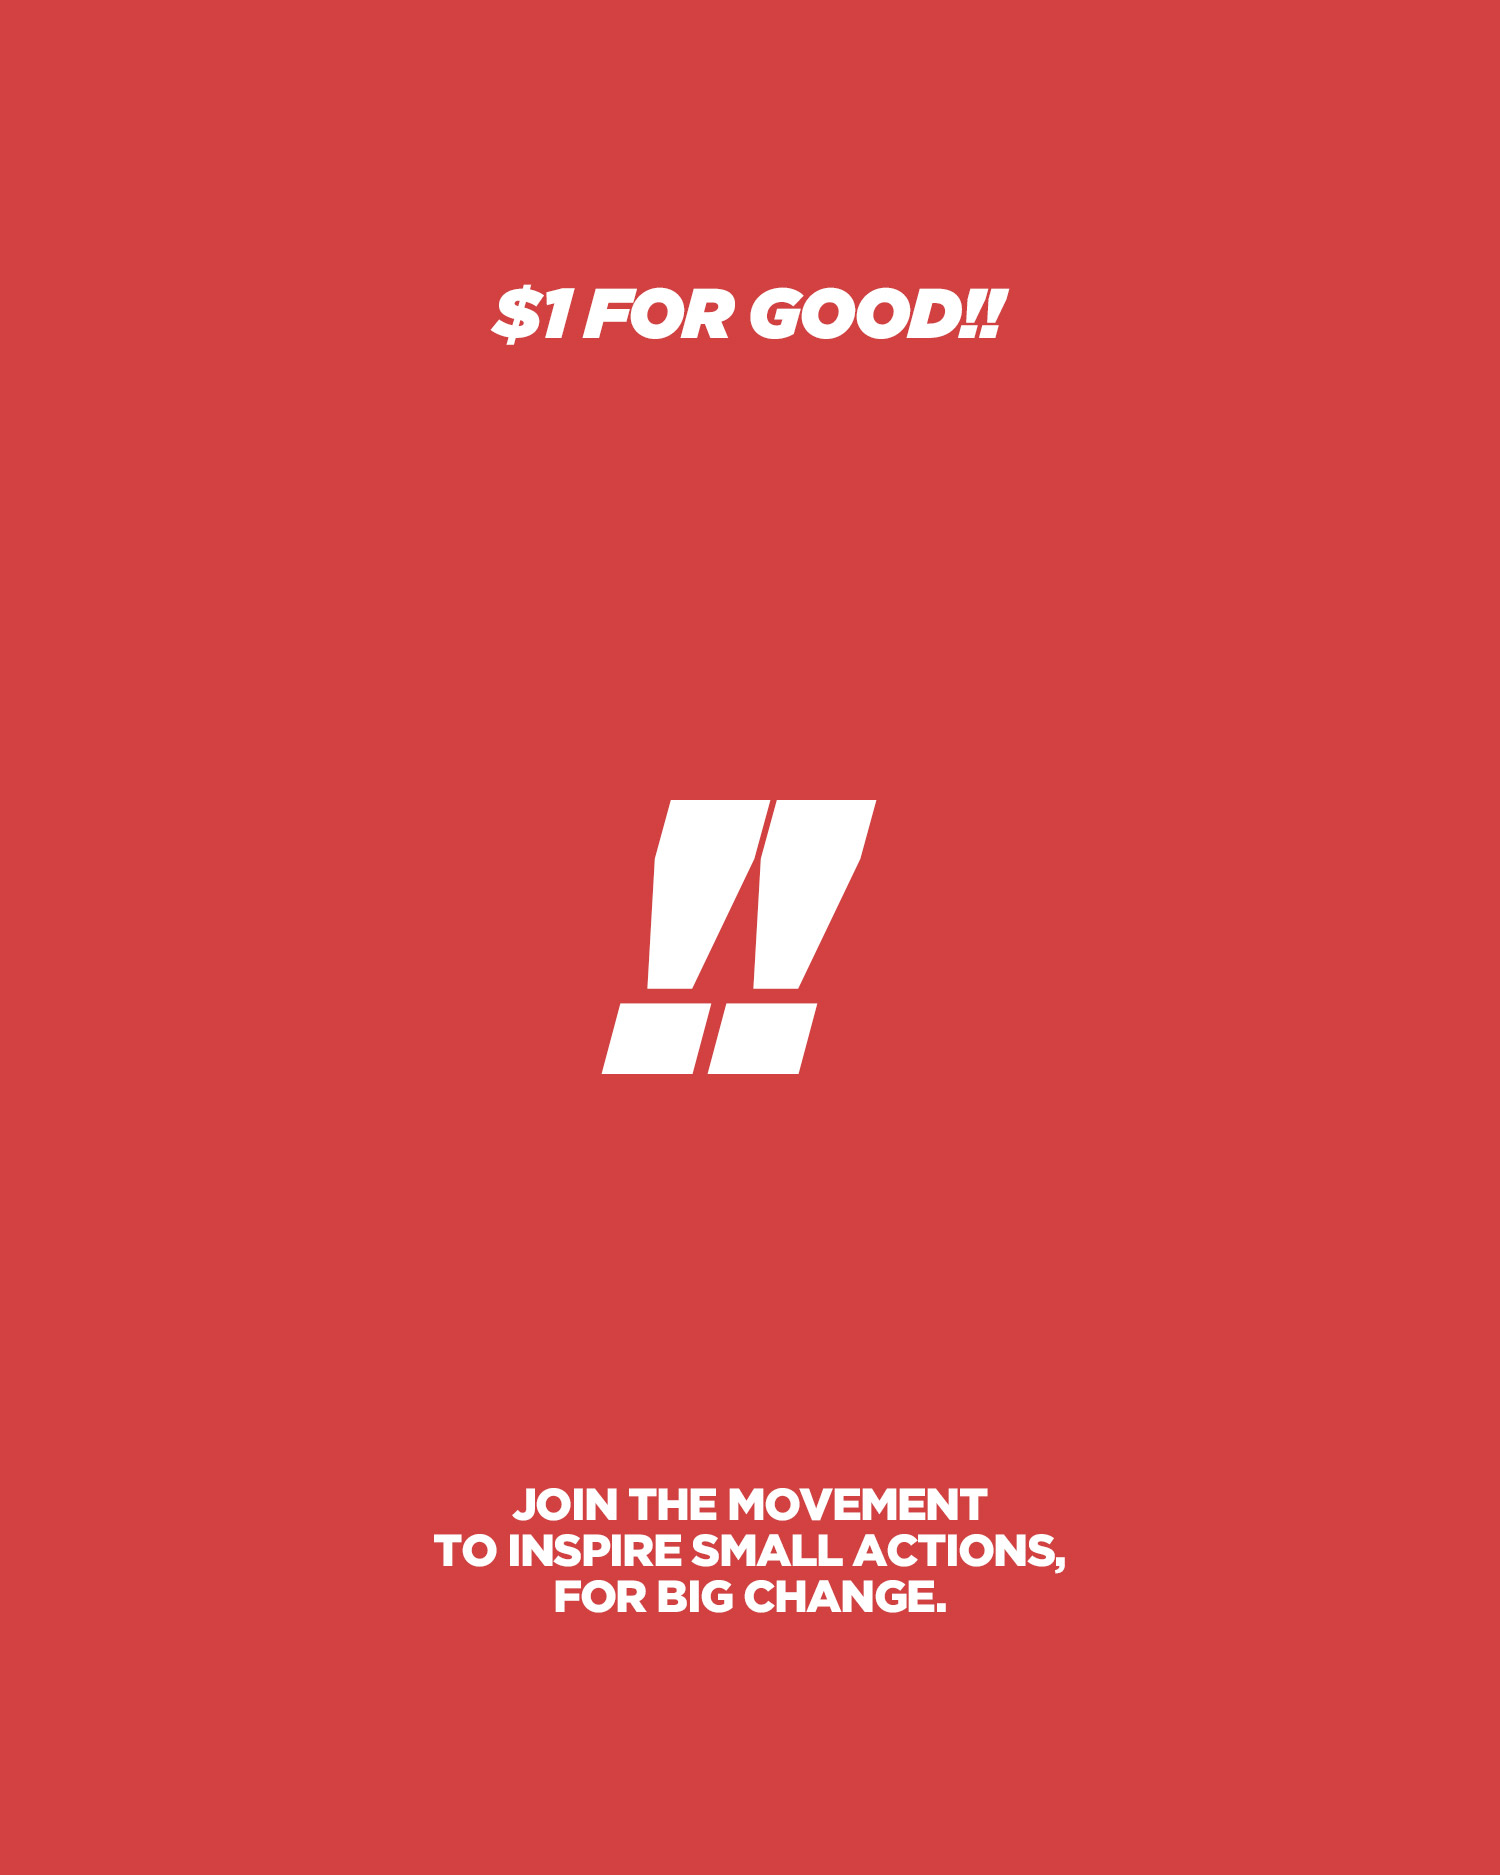 A Dollar for Good